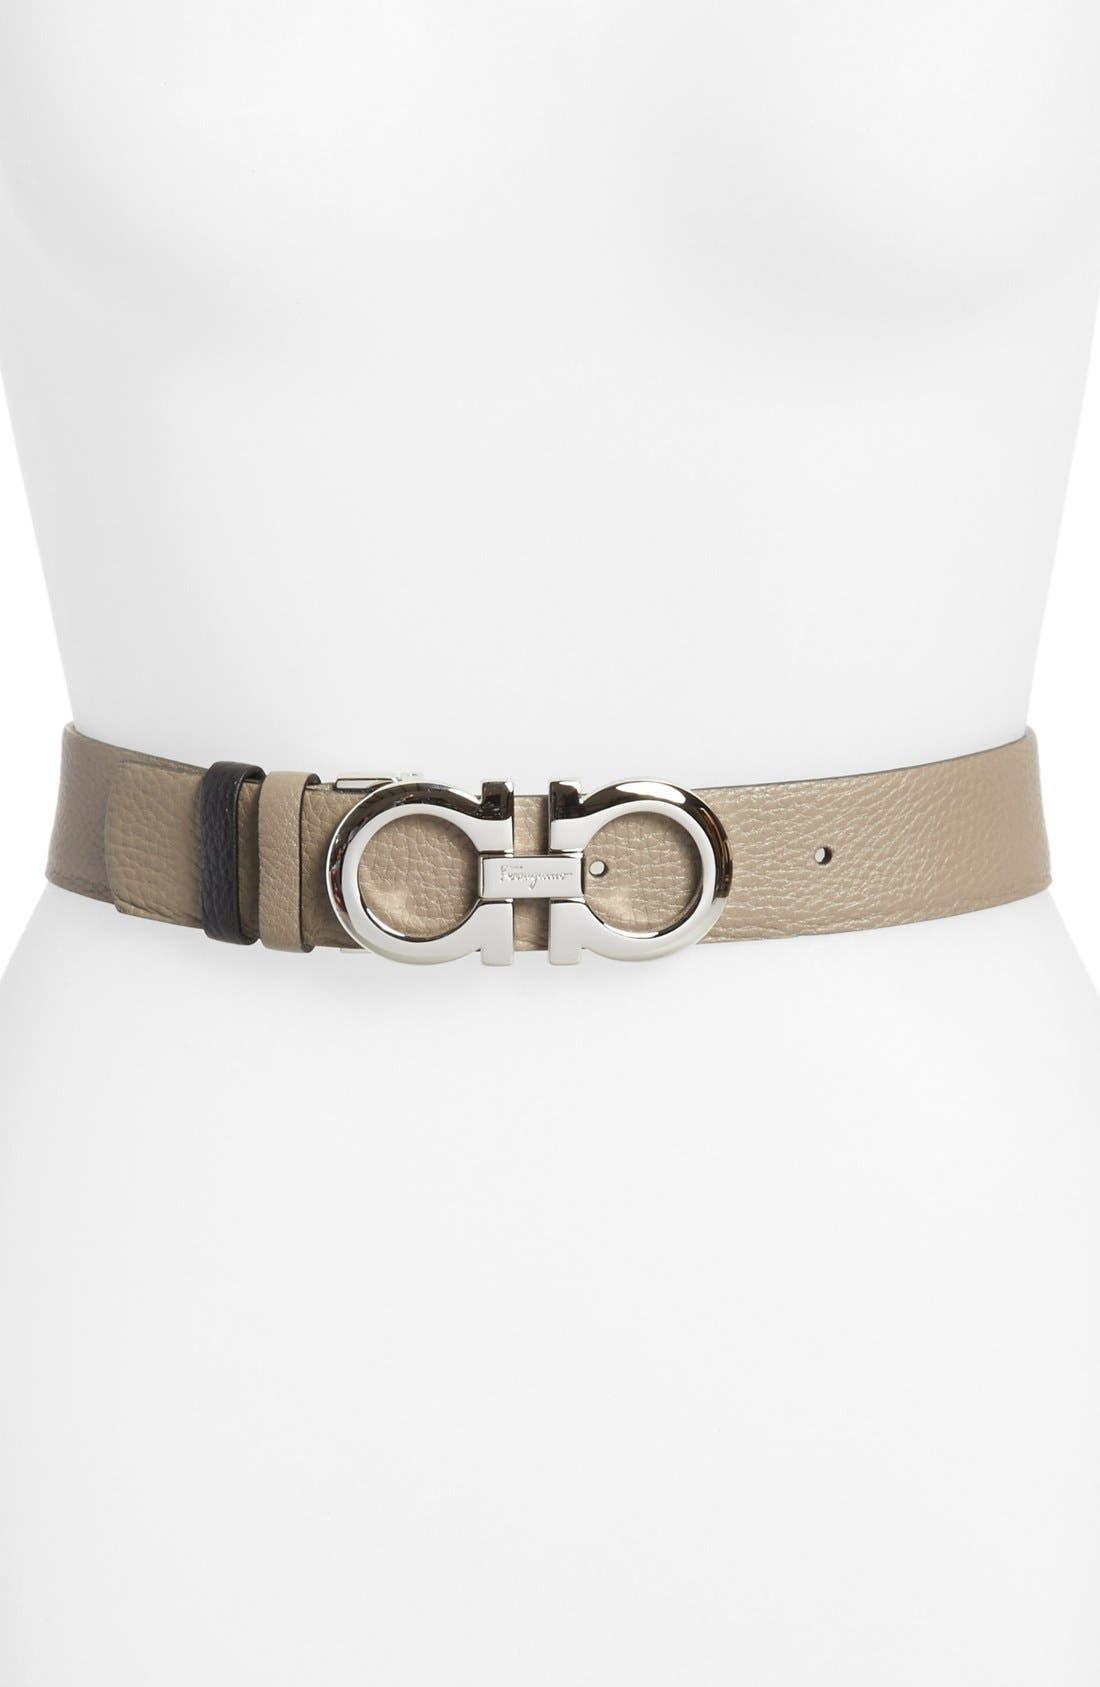 Main Image - Salvatore Ferragamo Gancini Reversible Belt